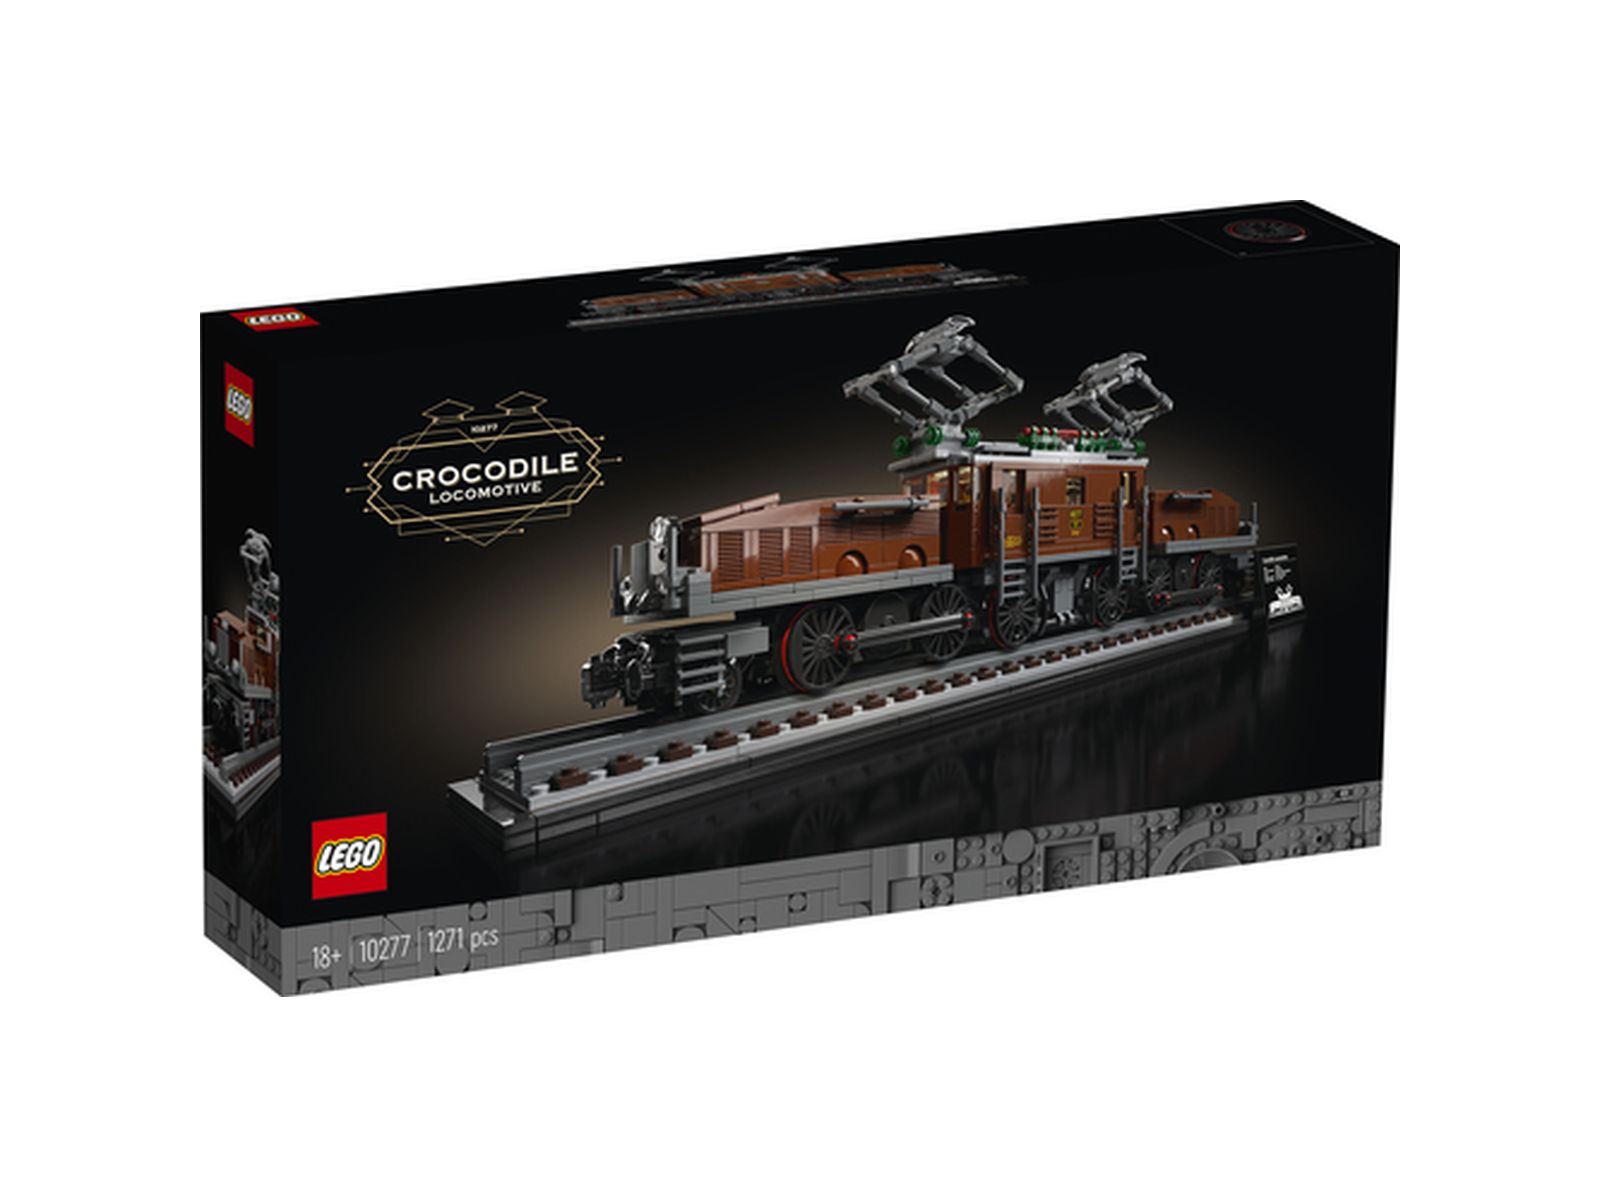 Lego creator expert locomotiva coccodrillo - 10277 - Creator Expert